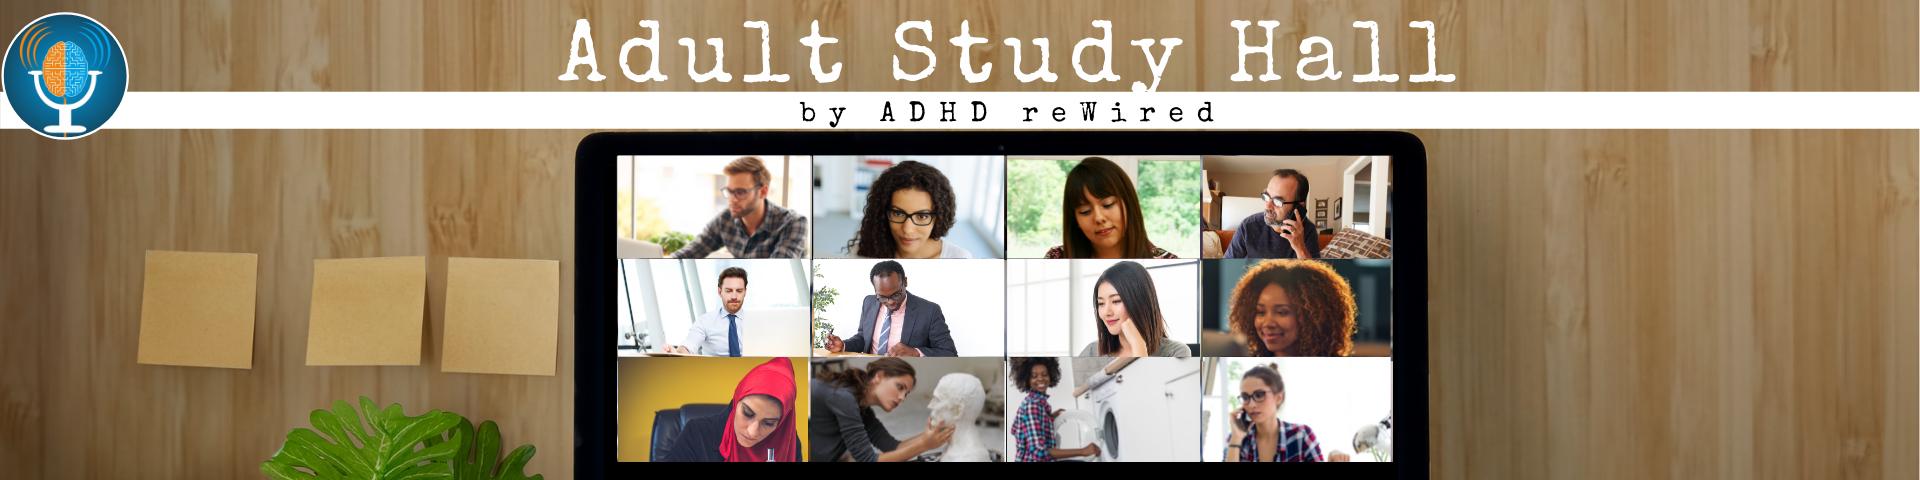 Adult Study Hall